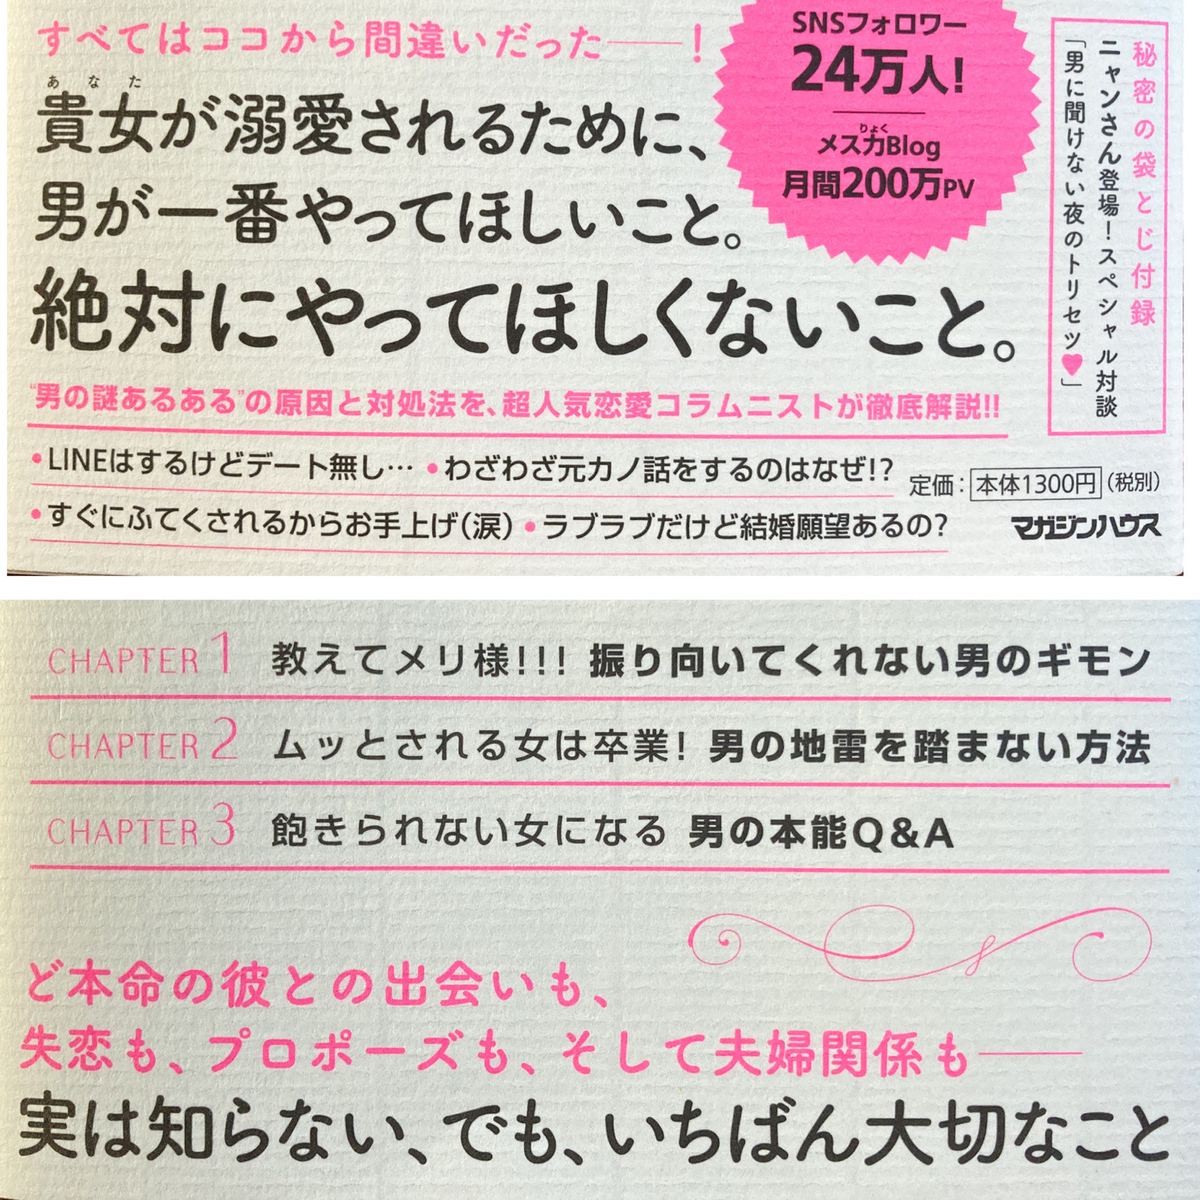 f:id:hirataikahono:20210125152401j:plain